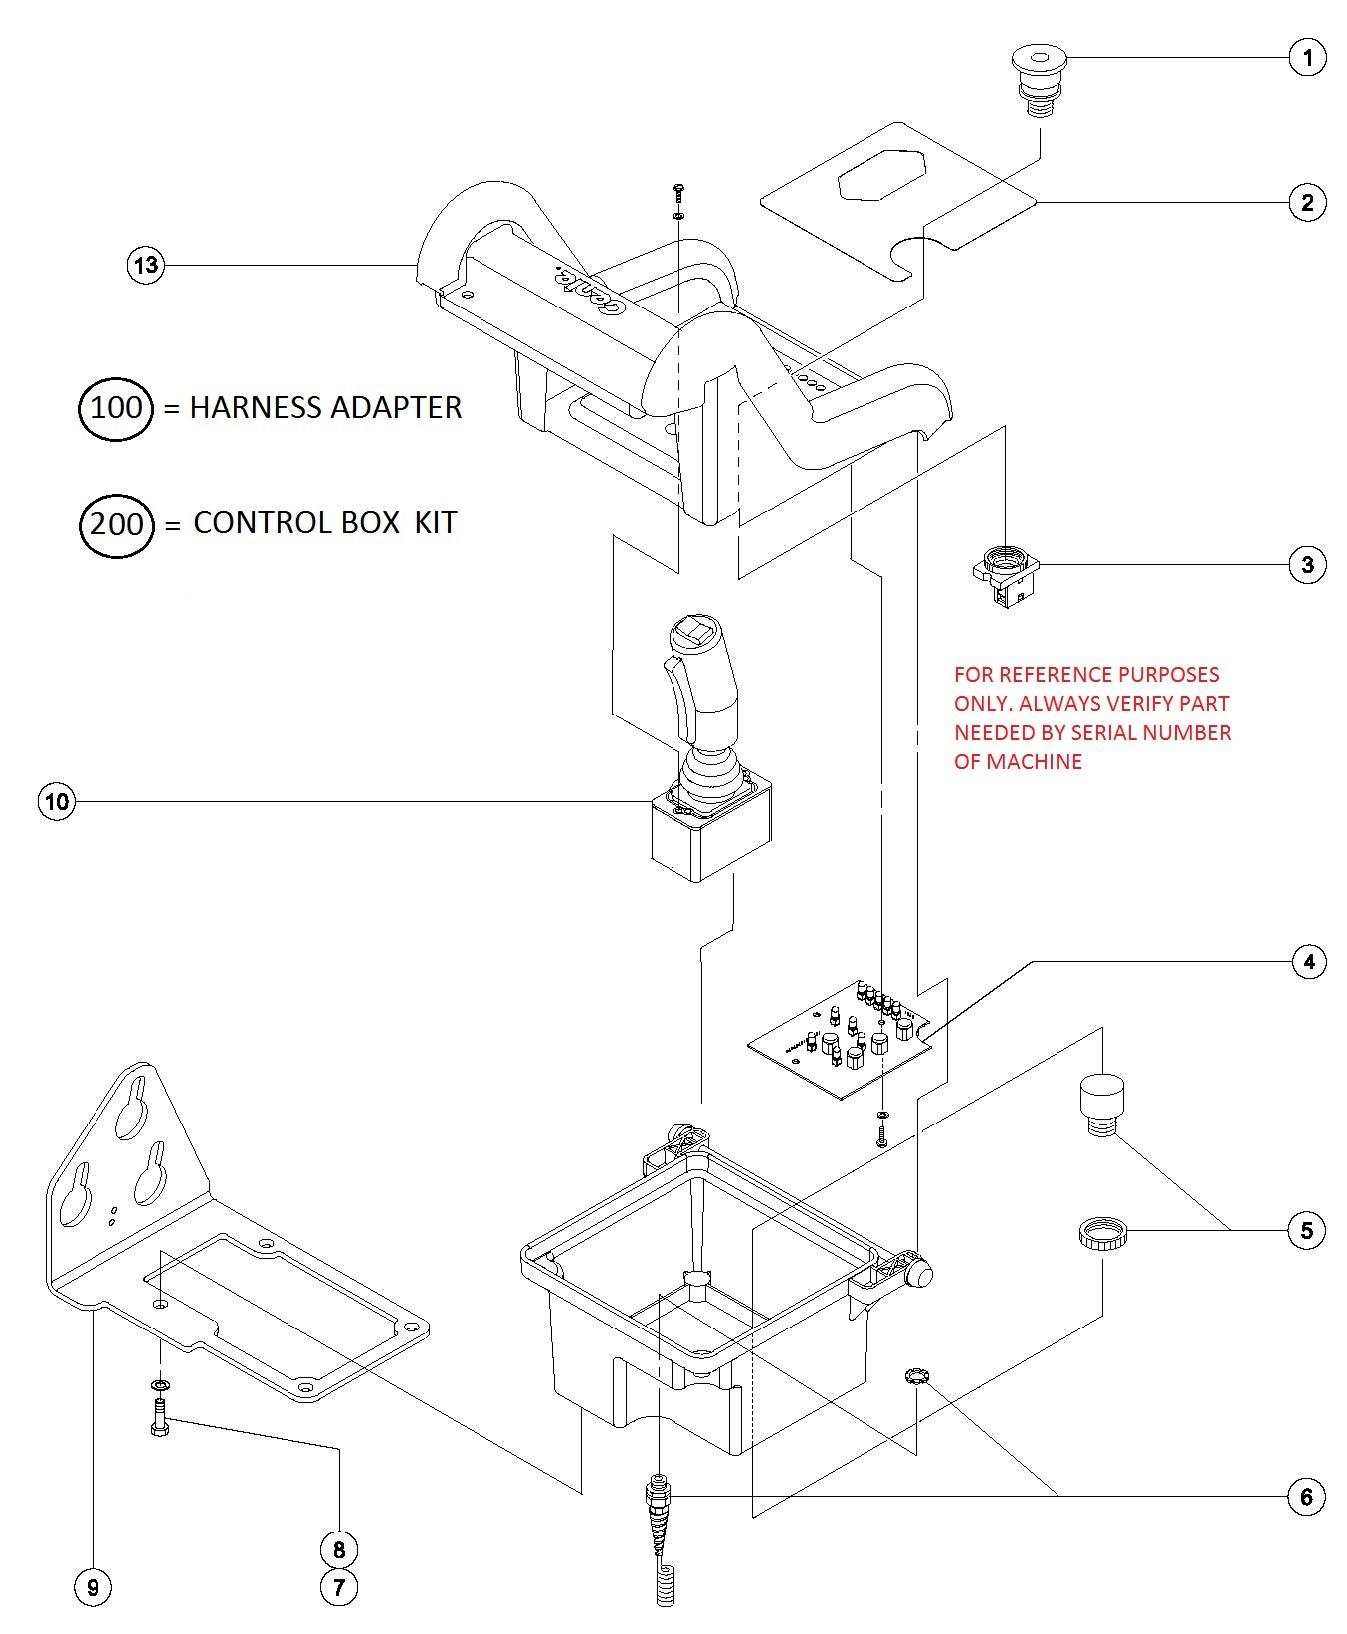 Mopar Hei Distributor Wire Diagram For Kmj   Wiring Diagram Liries on mopar tach wiring diagram, mopar squareback alternator wiring diagram, mopar neutral safety switch diagram, mopar ignition system diagram, mopar hei distributor,